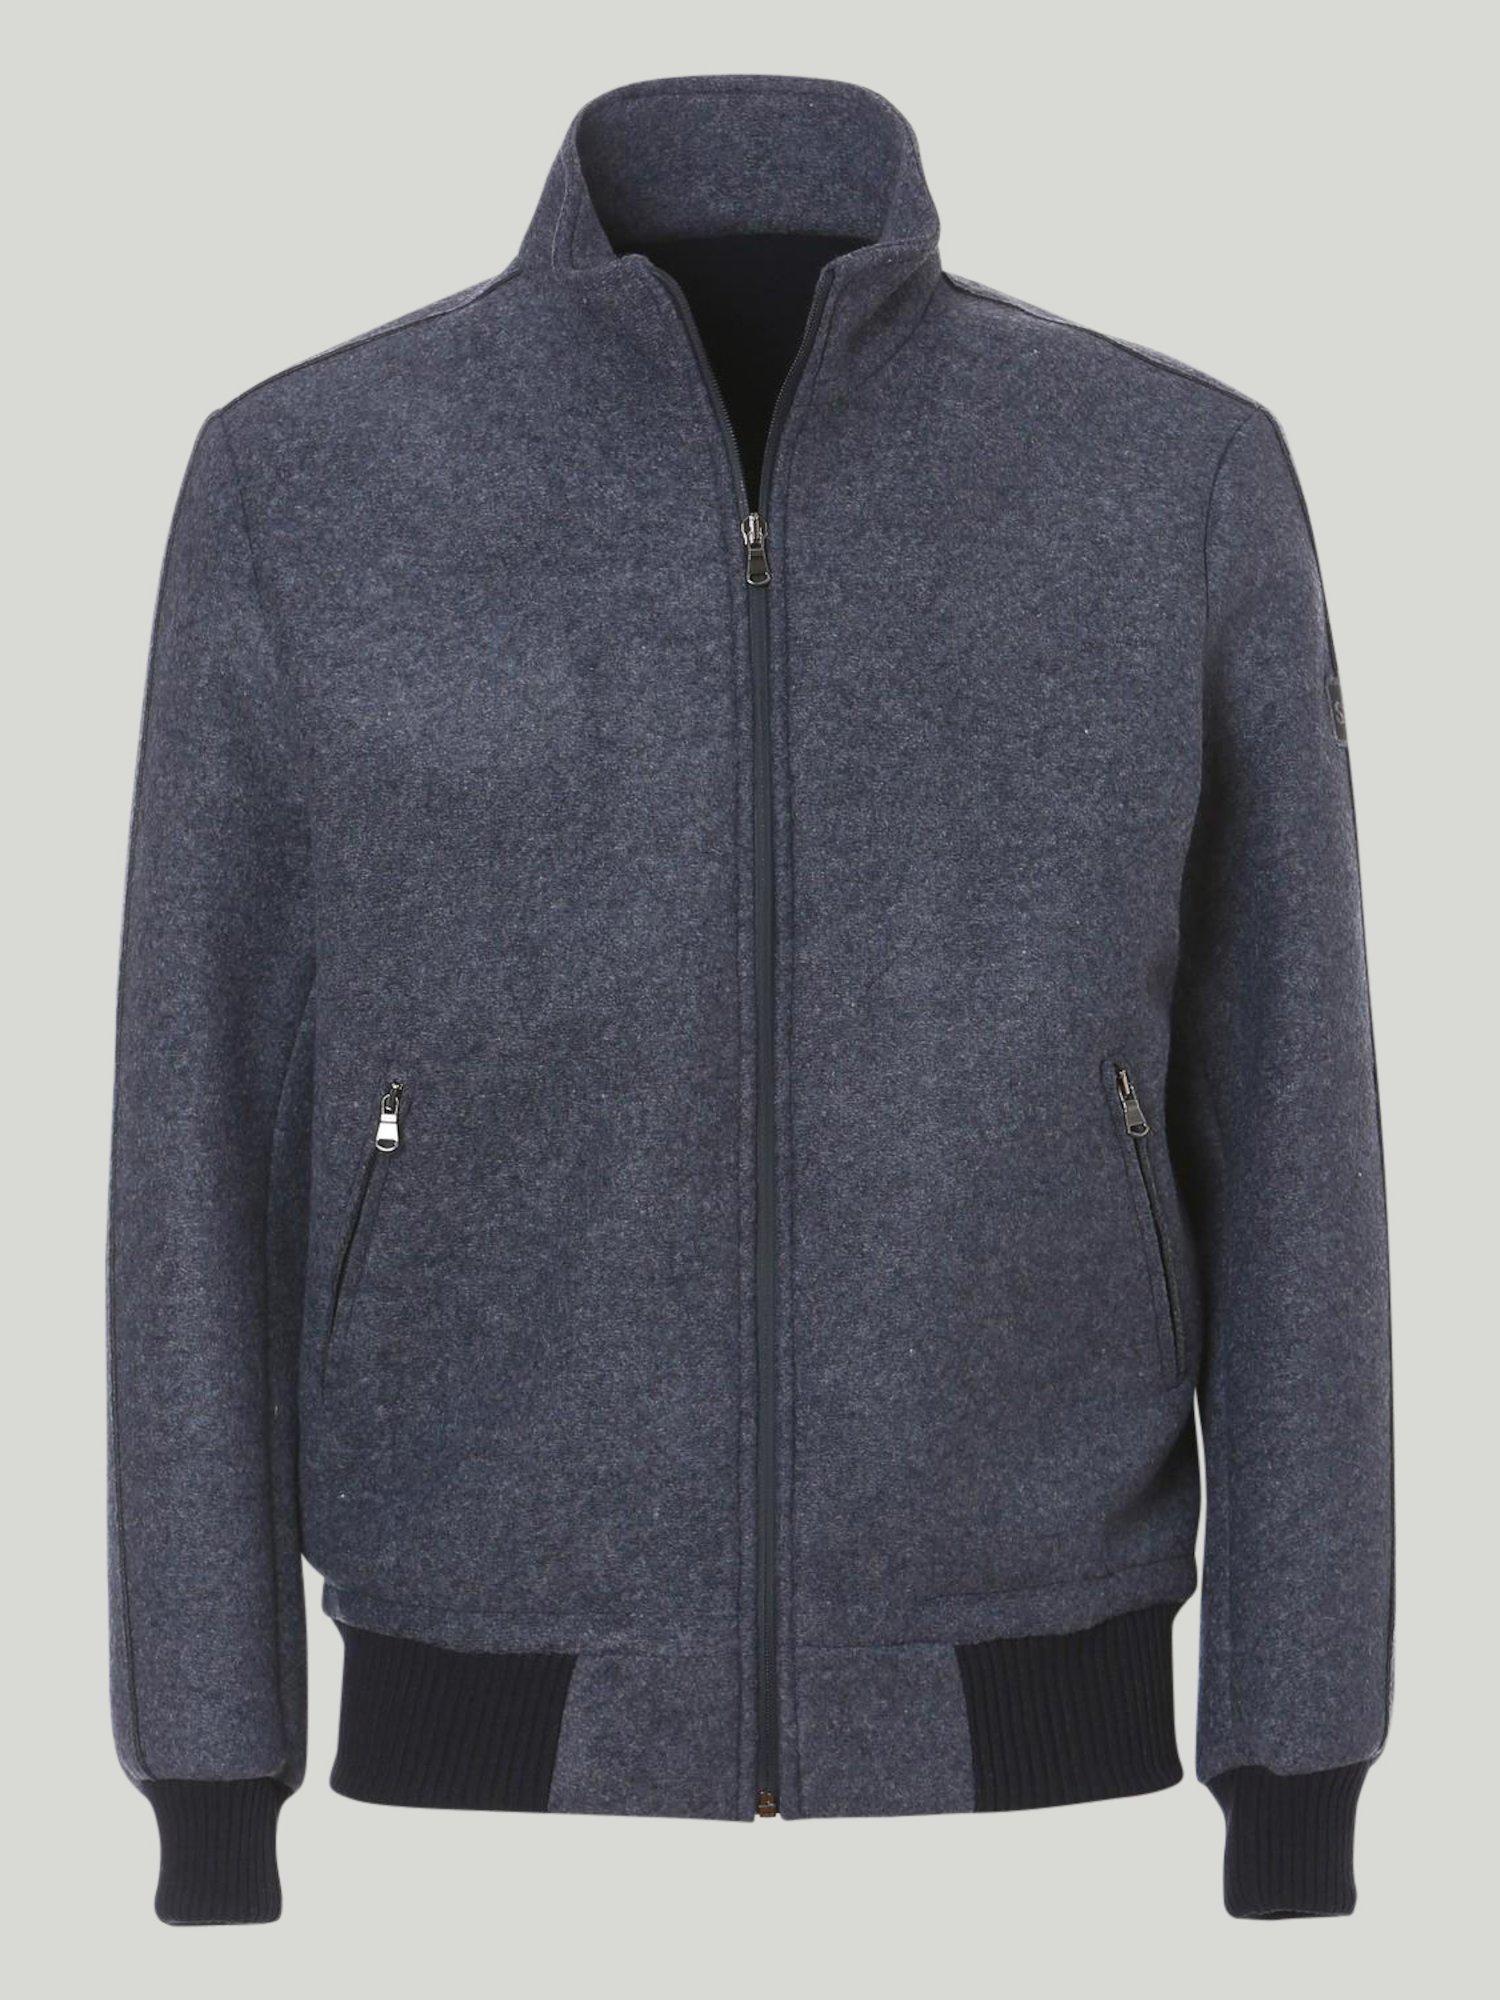 Warm Jibe jacket - Avio